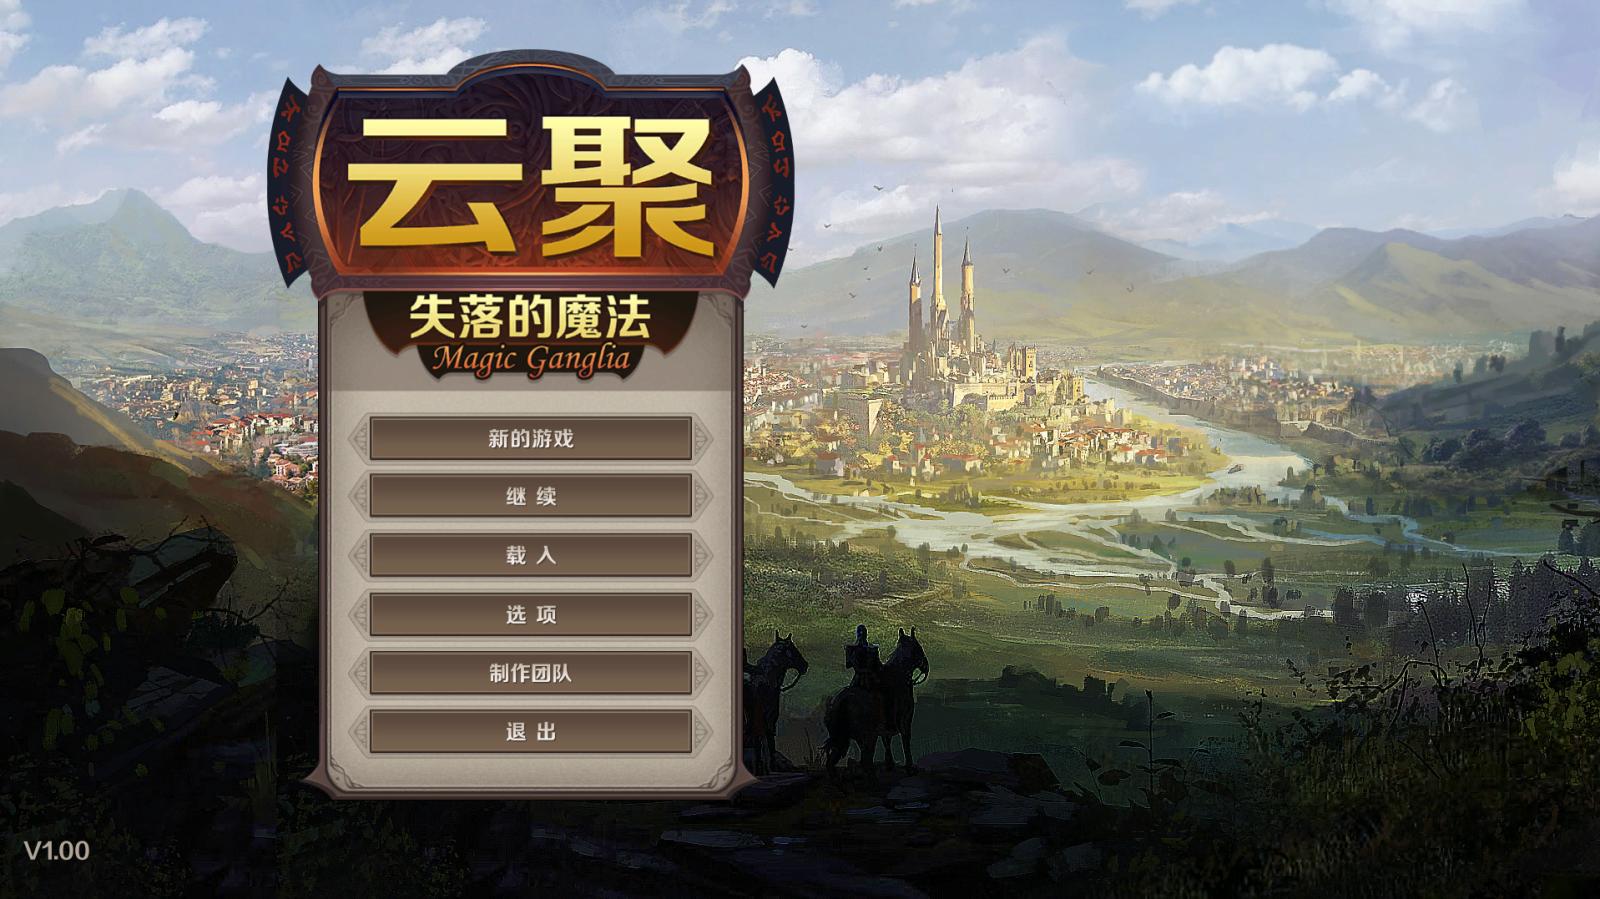 CRPG《云聚:失落的魔法》于8.16日在steam发售,由国内跑团圈资深DM开发。